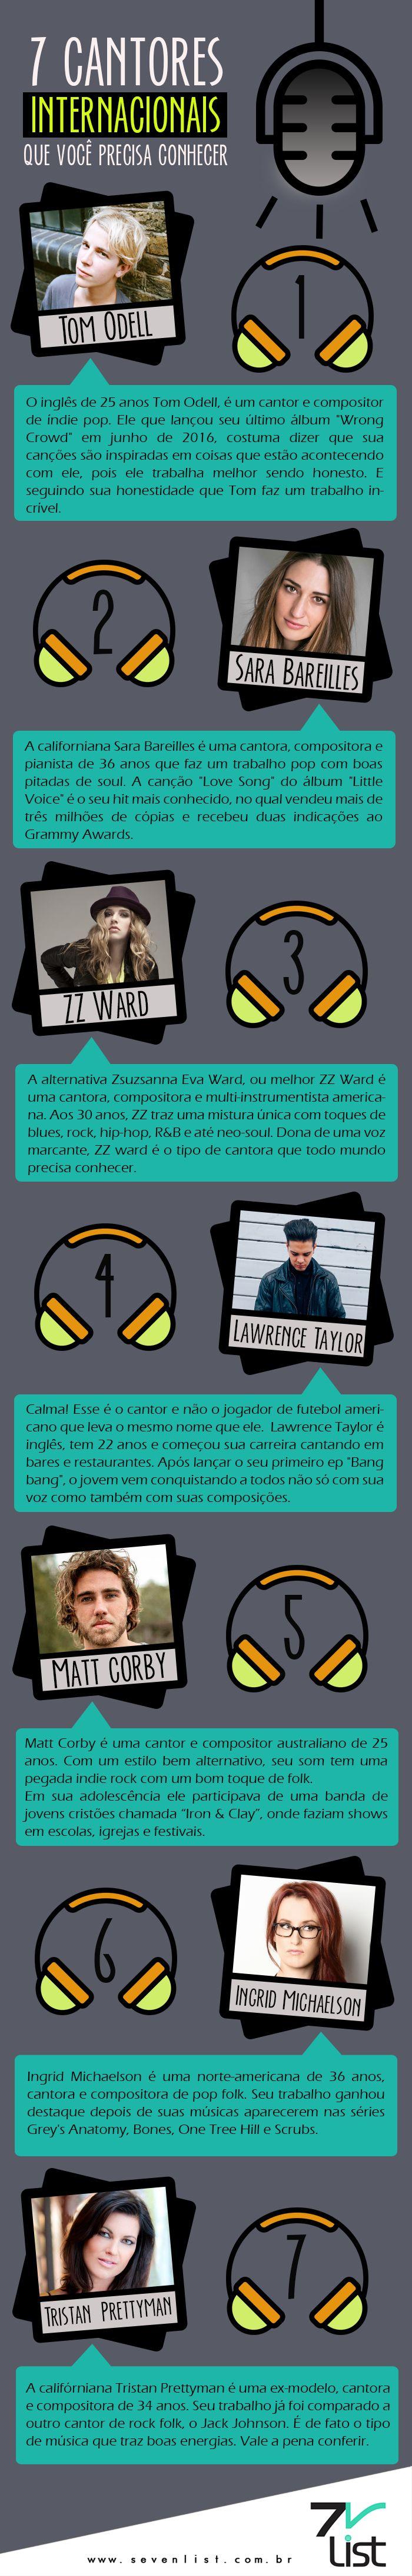 #Design #Music #Entretenimento #Infográfico #Singer #Sing www.sevenlist.com.br